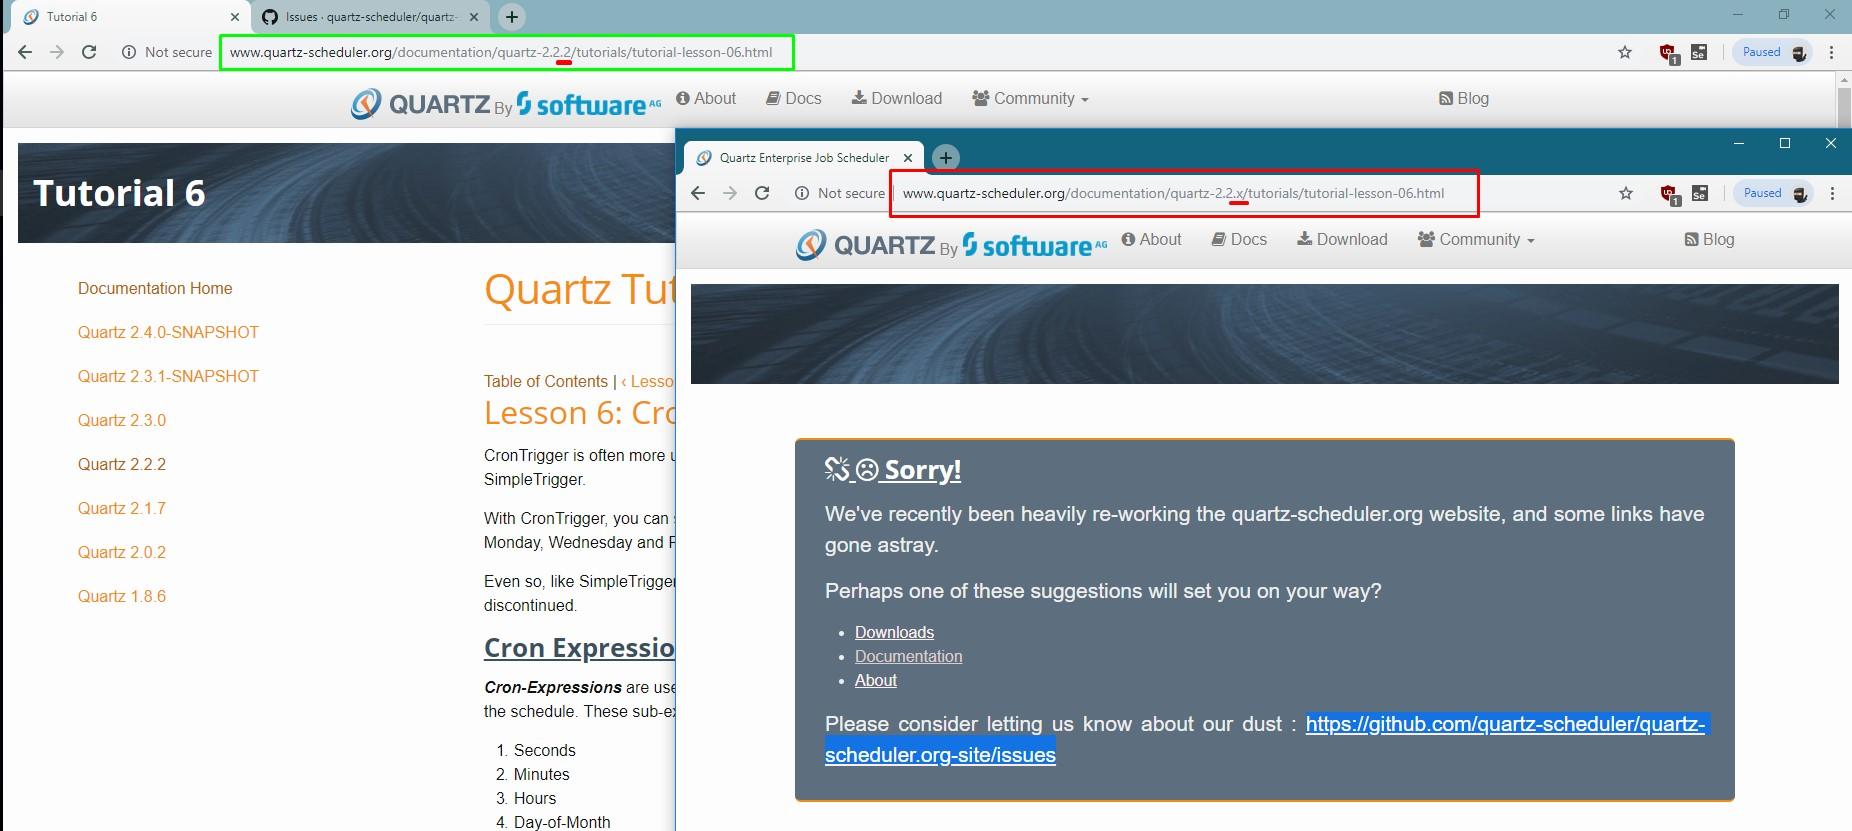 Quartz 2 2 3 Documentation: some links have gone astray